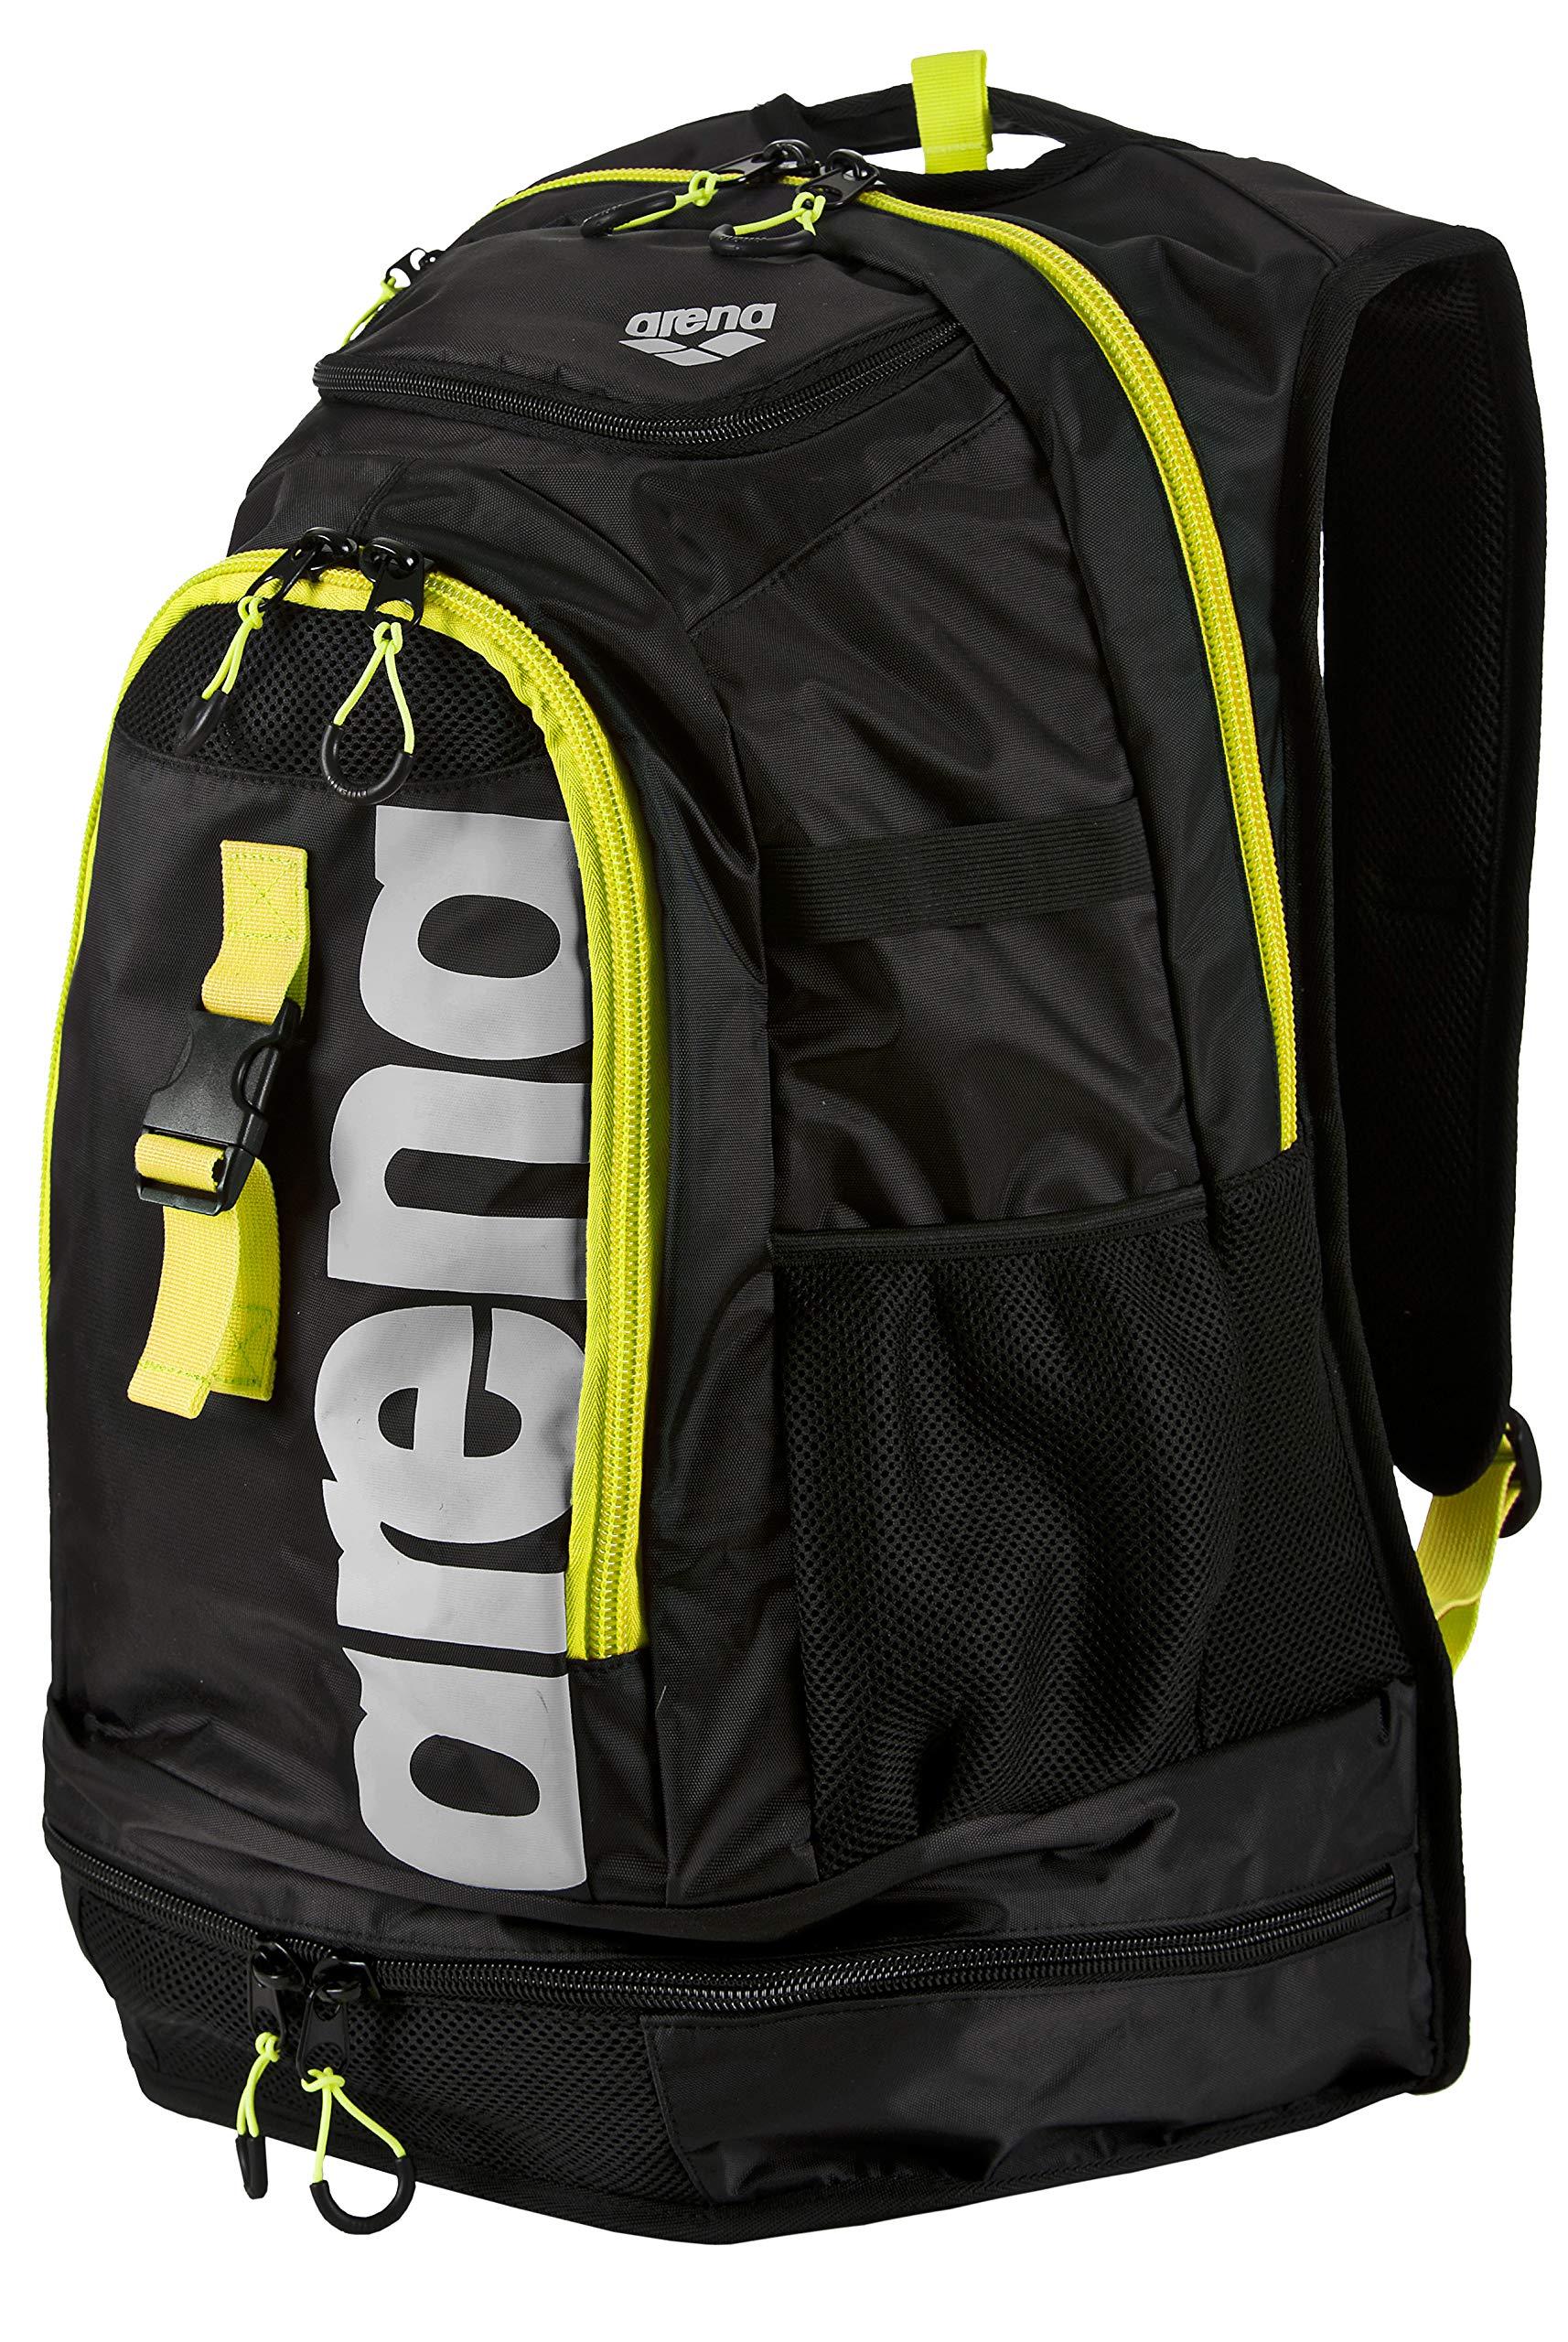 L Adulto Yell X Arena Mochila Unisex Negro Cm blackfluo Fastpack H w 1 36x24x45 2 XUwwCxAn6q